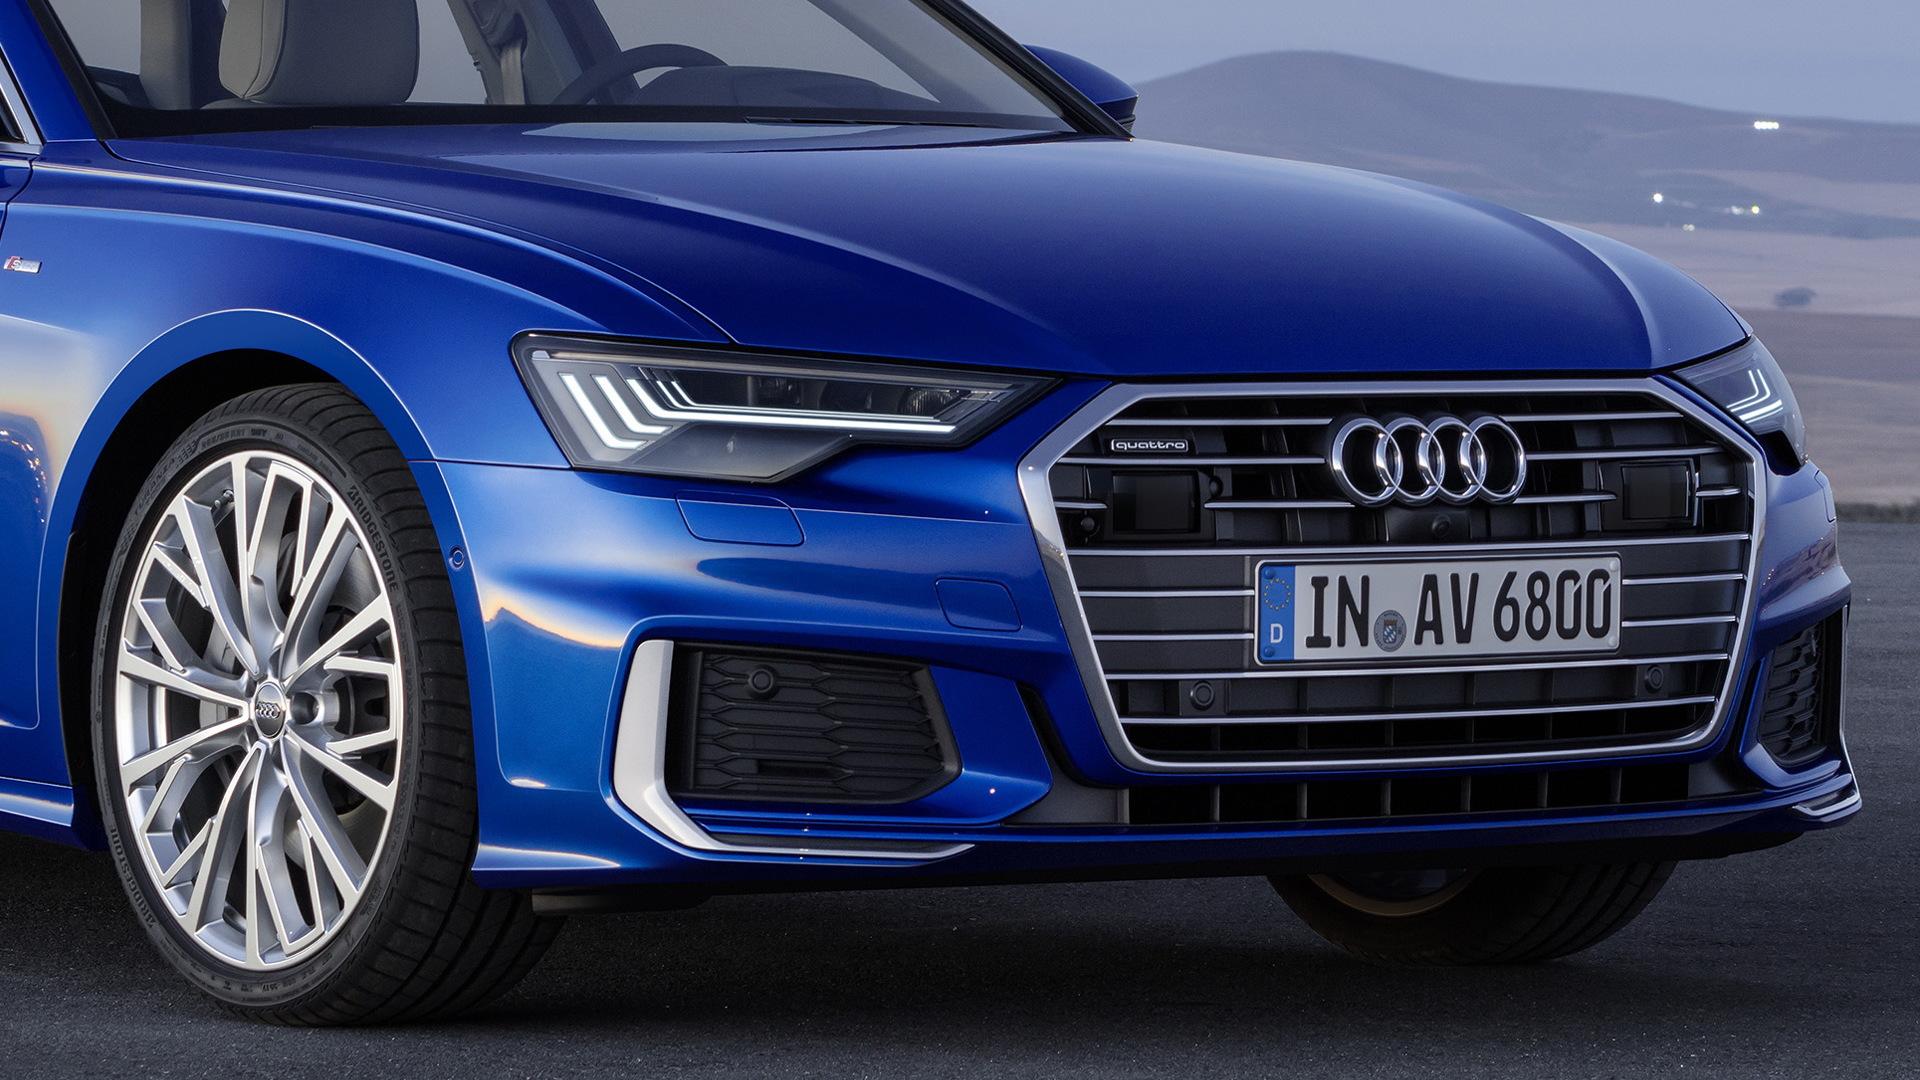 2019 Audi A6 Avant Wagon Revealed